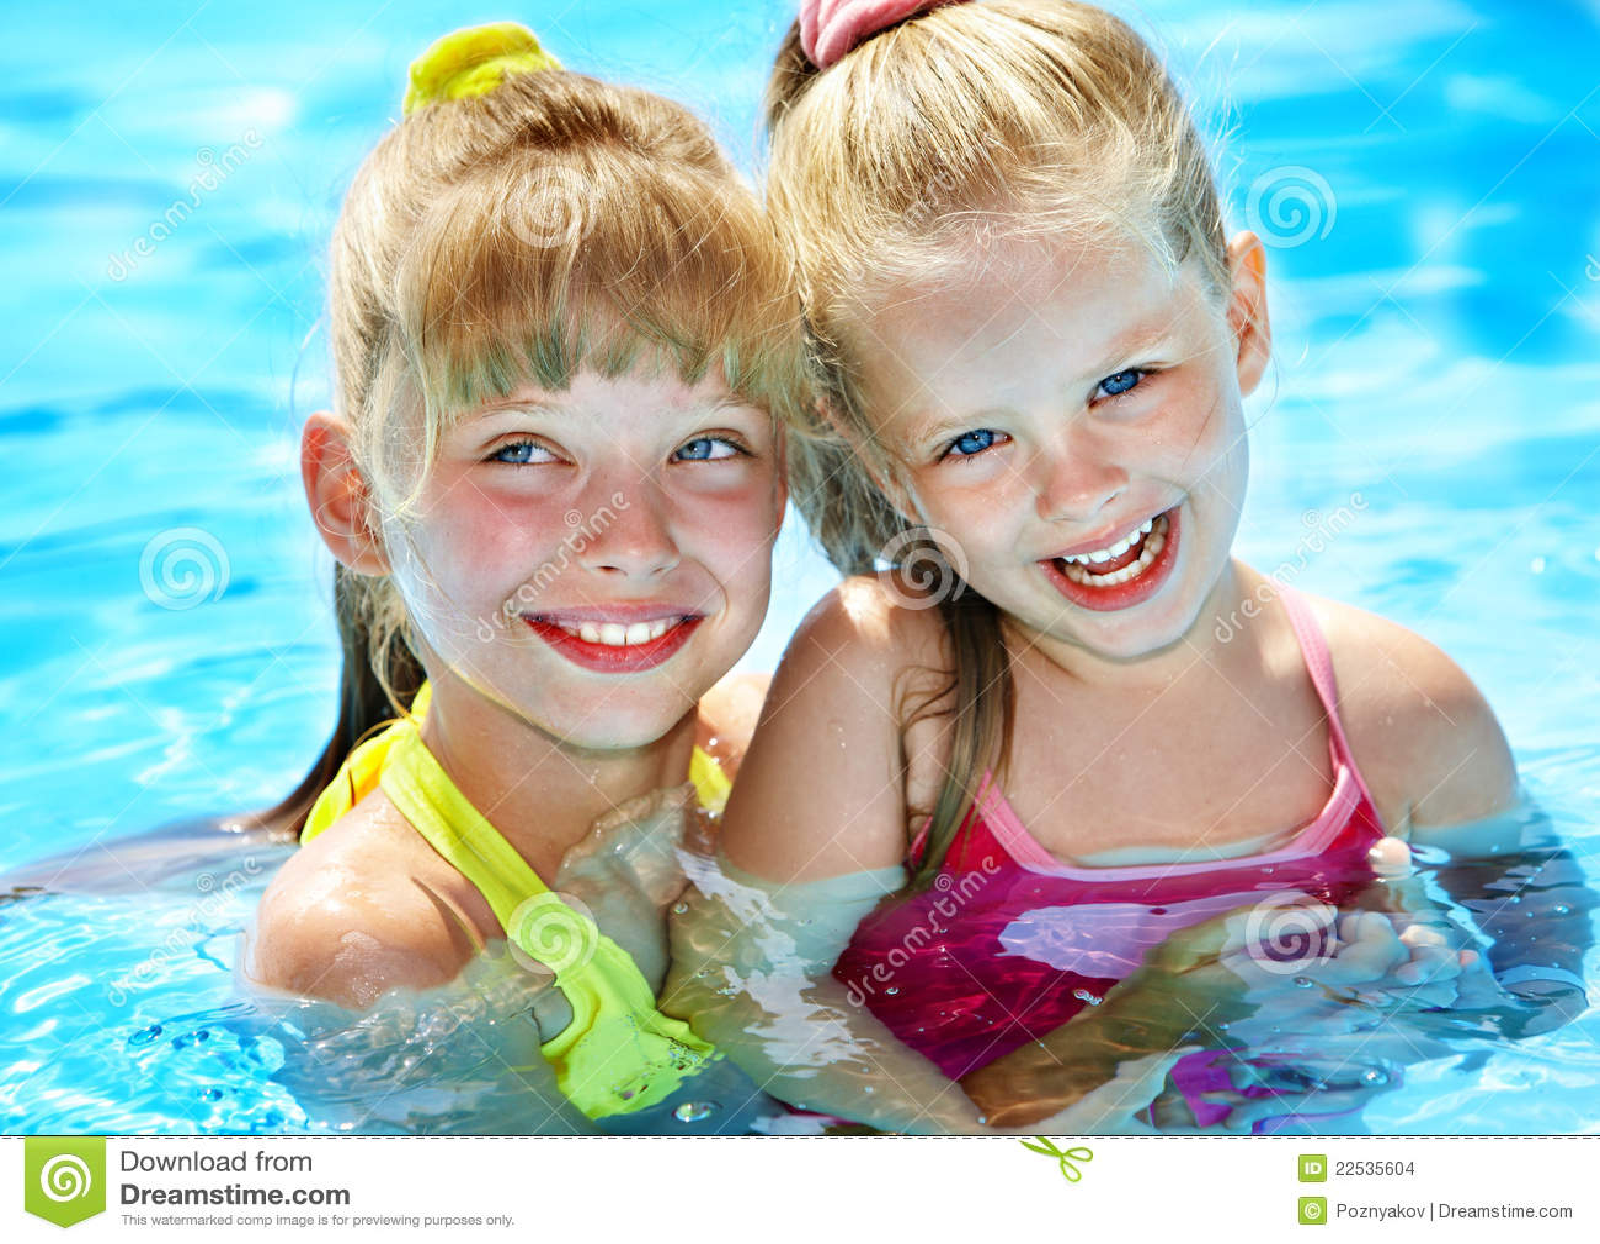 Children in swimming pool stock photo image of child 22535604 for How many children die in swimming pools